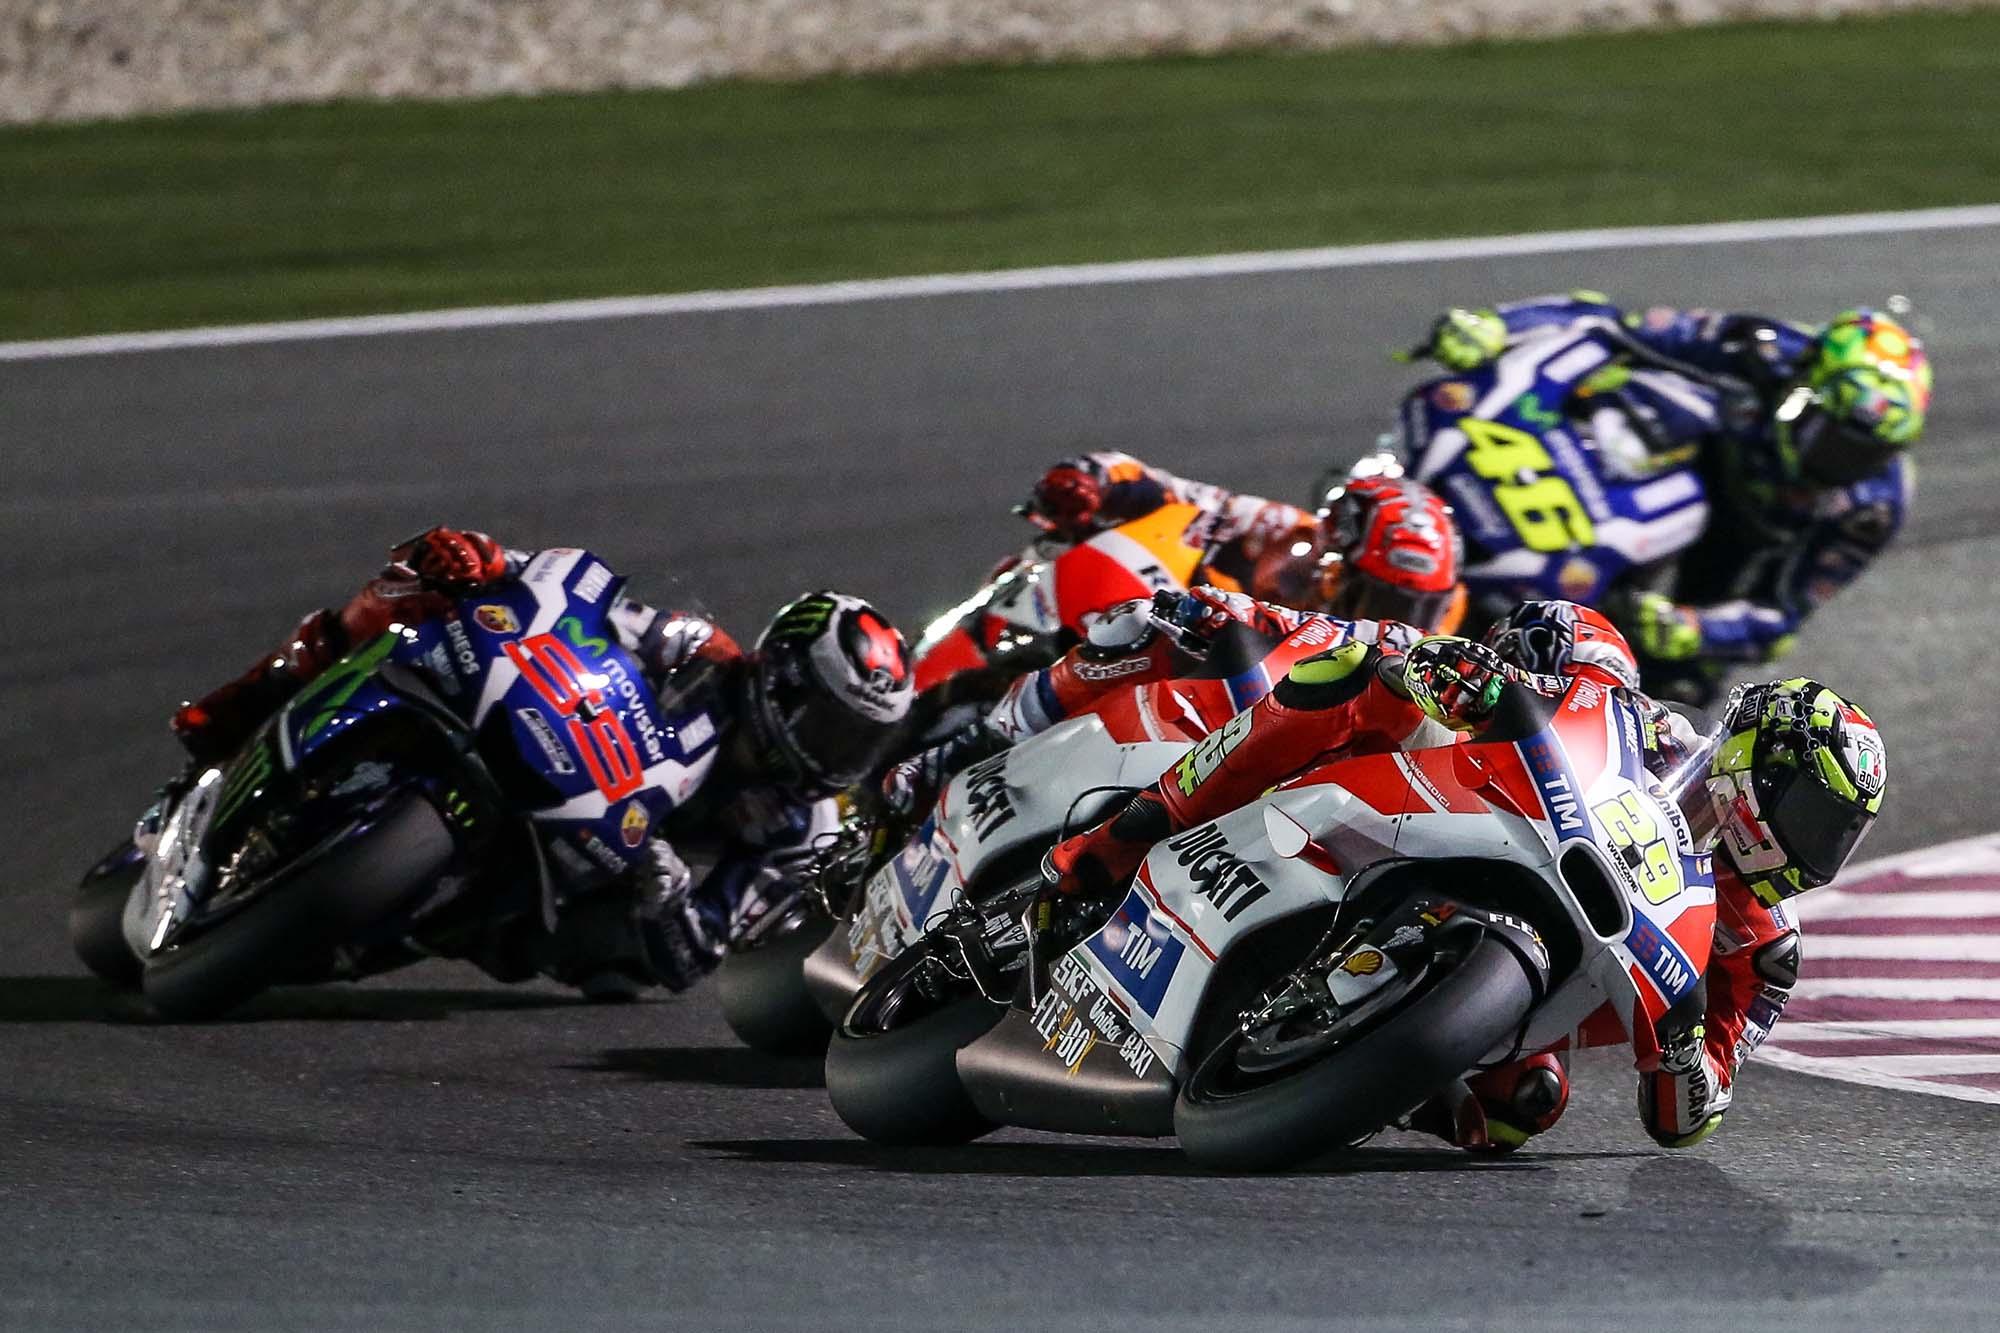 [GP] Qatar - Page 2 MotoGP-Qatar-GP-Sunday-WUP-race-CormacGP-63